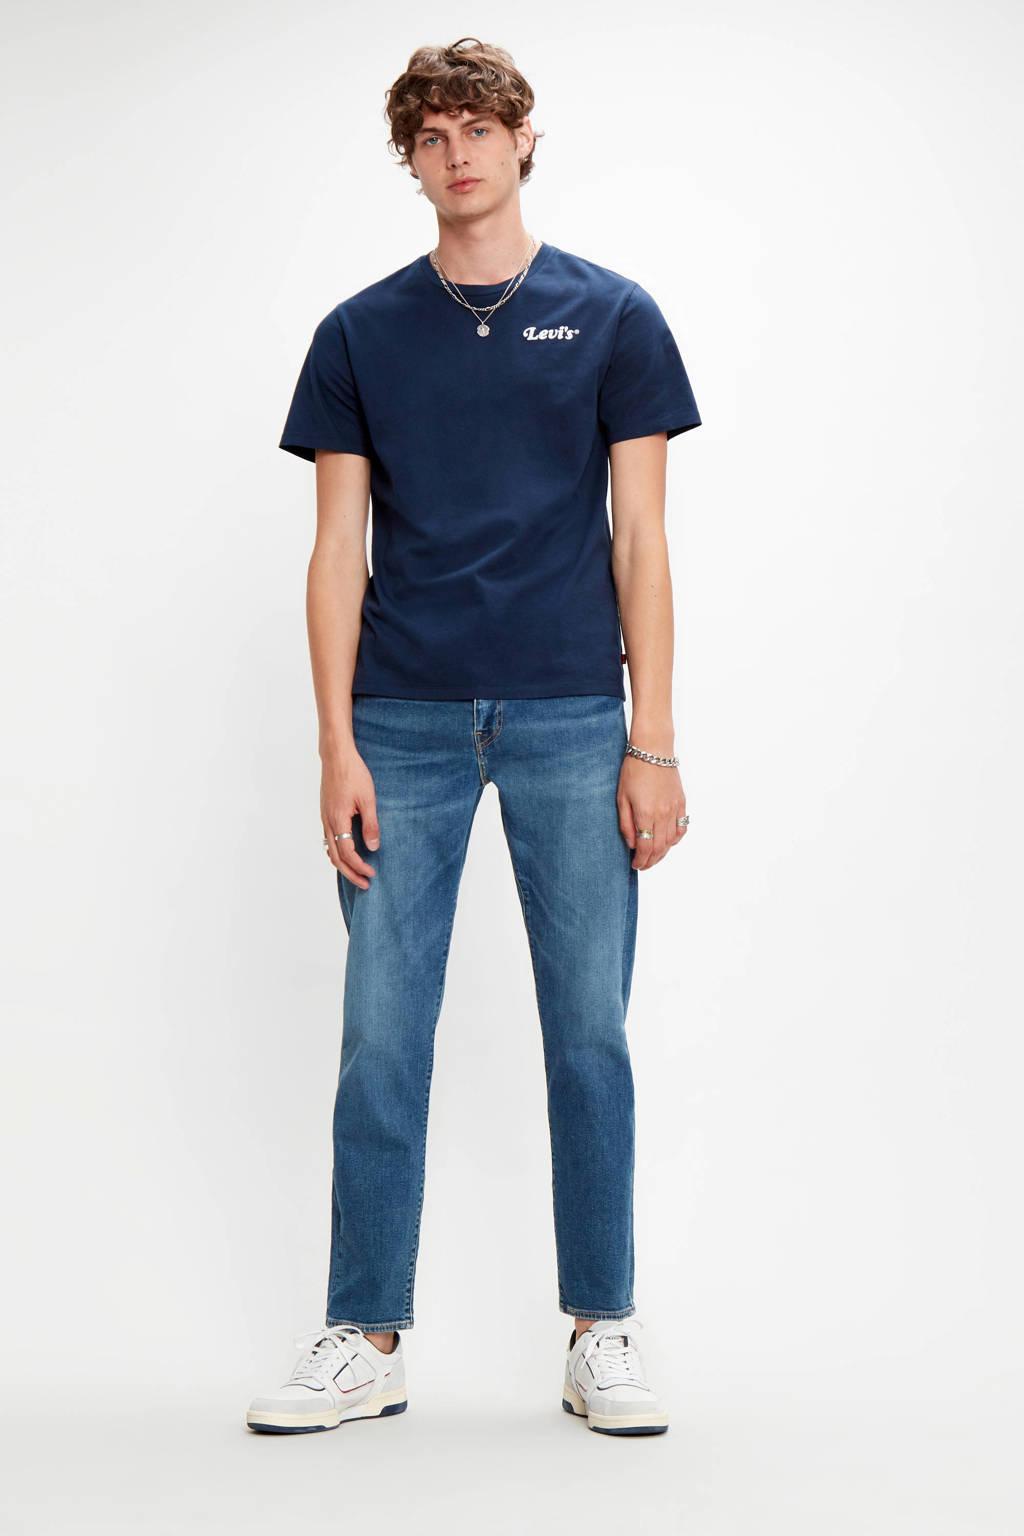 Levi's T-shirt met logo marine, Marine